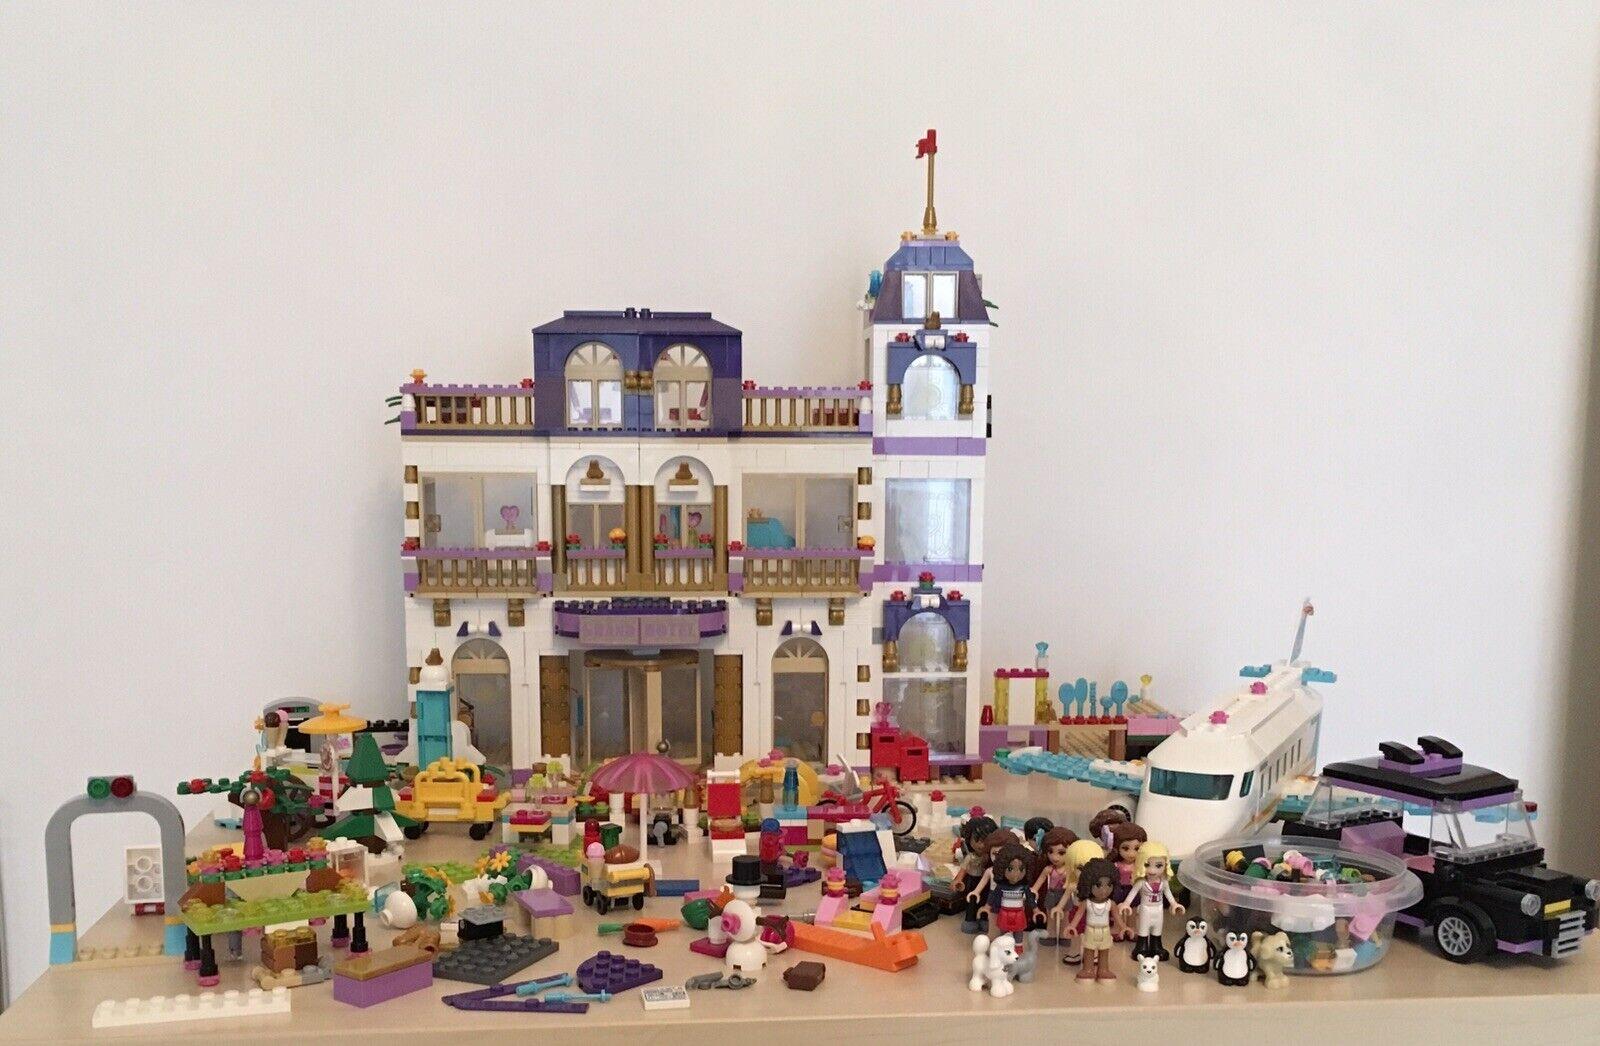 Lego Friends 41101, 41100, 41030, 41088.